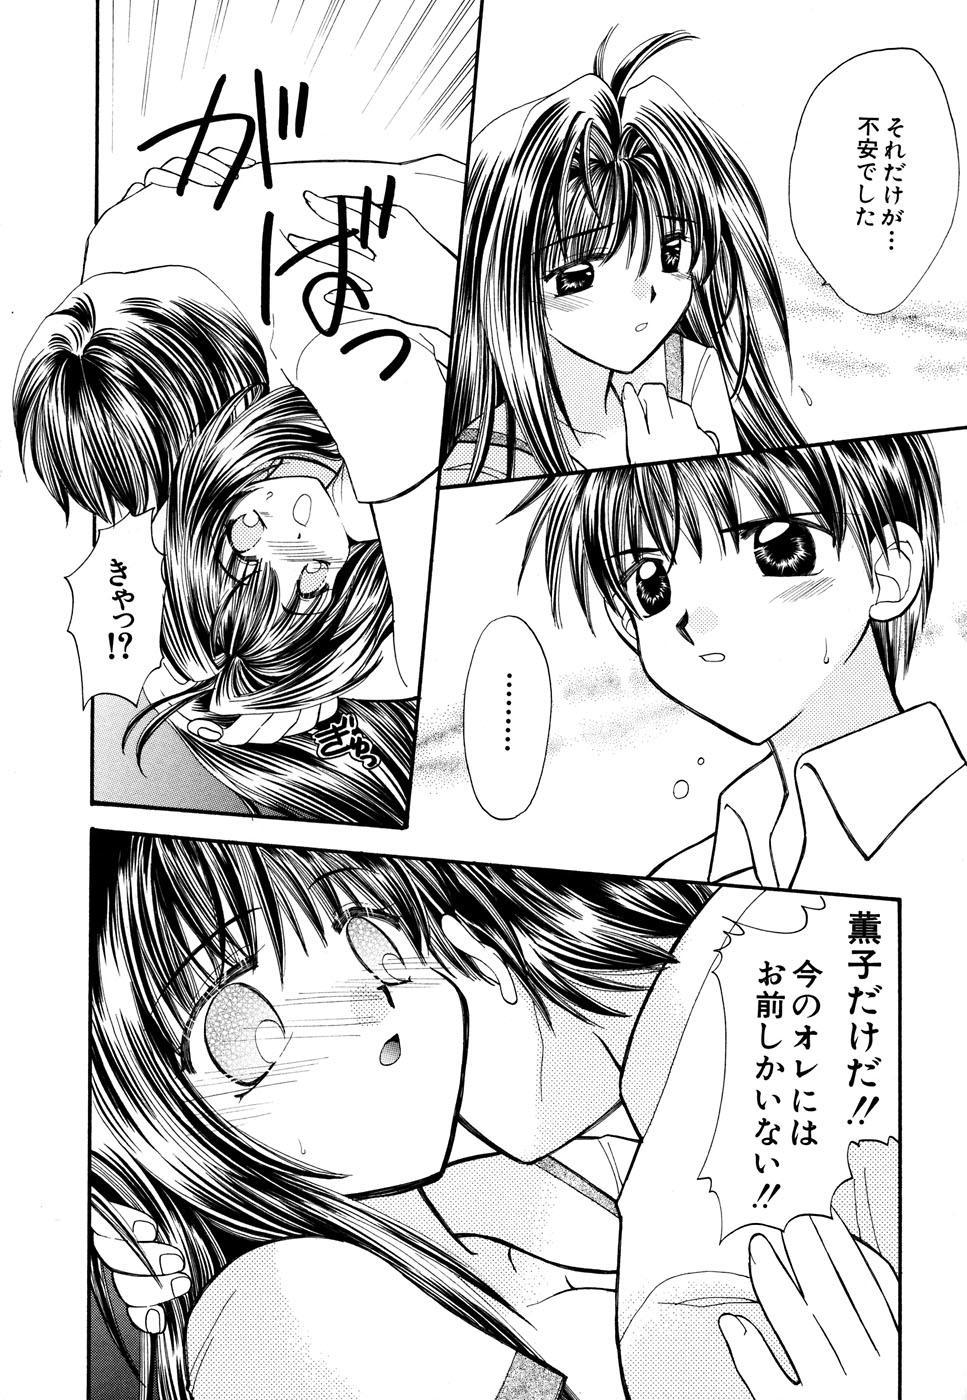 G-drive Vol.1 Ryoujokuhen 91